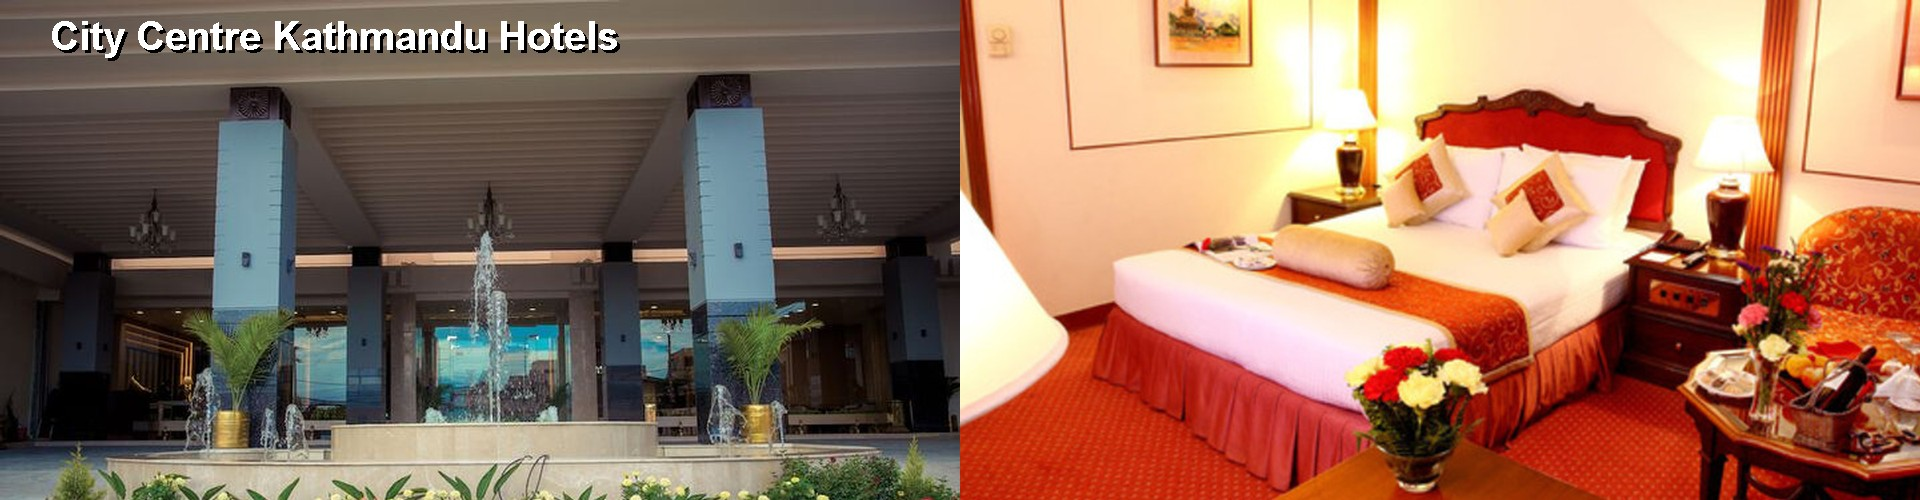 5 Best Hotels Near City Centre Kathmandu